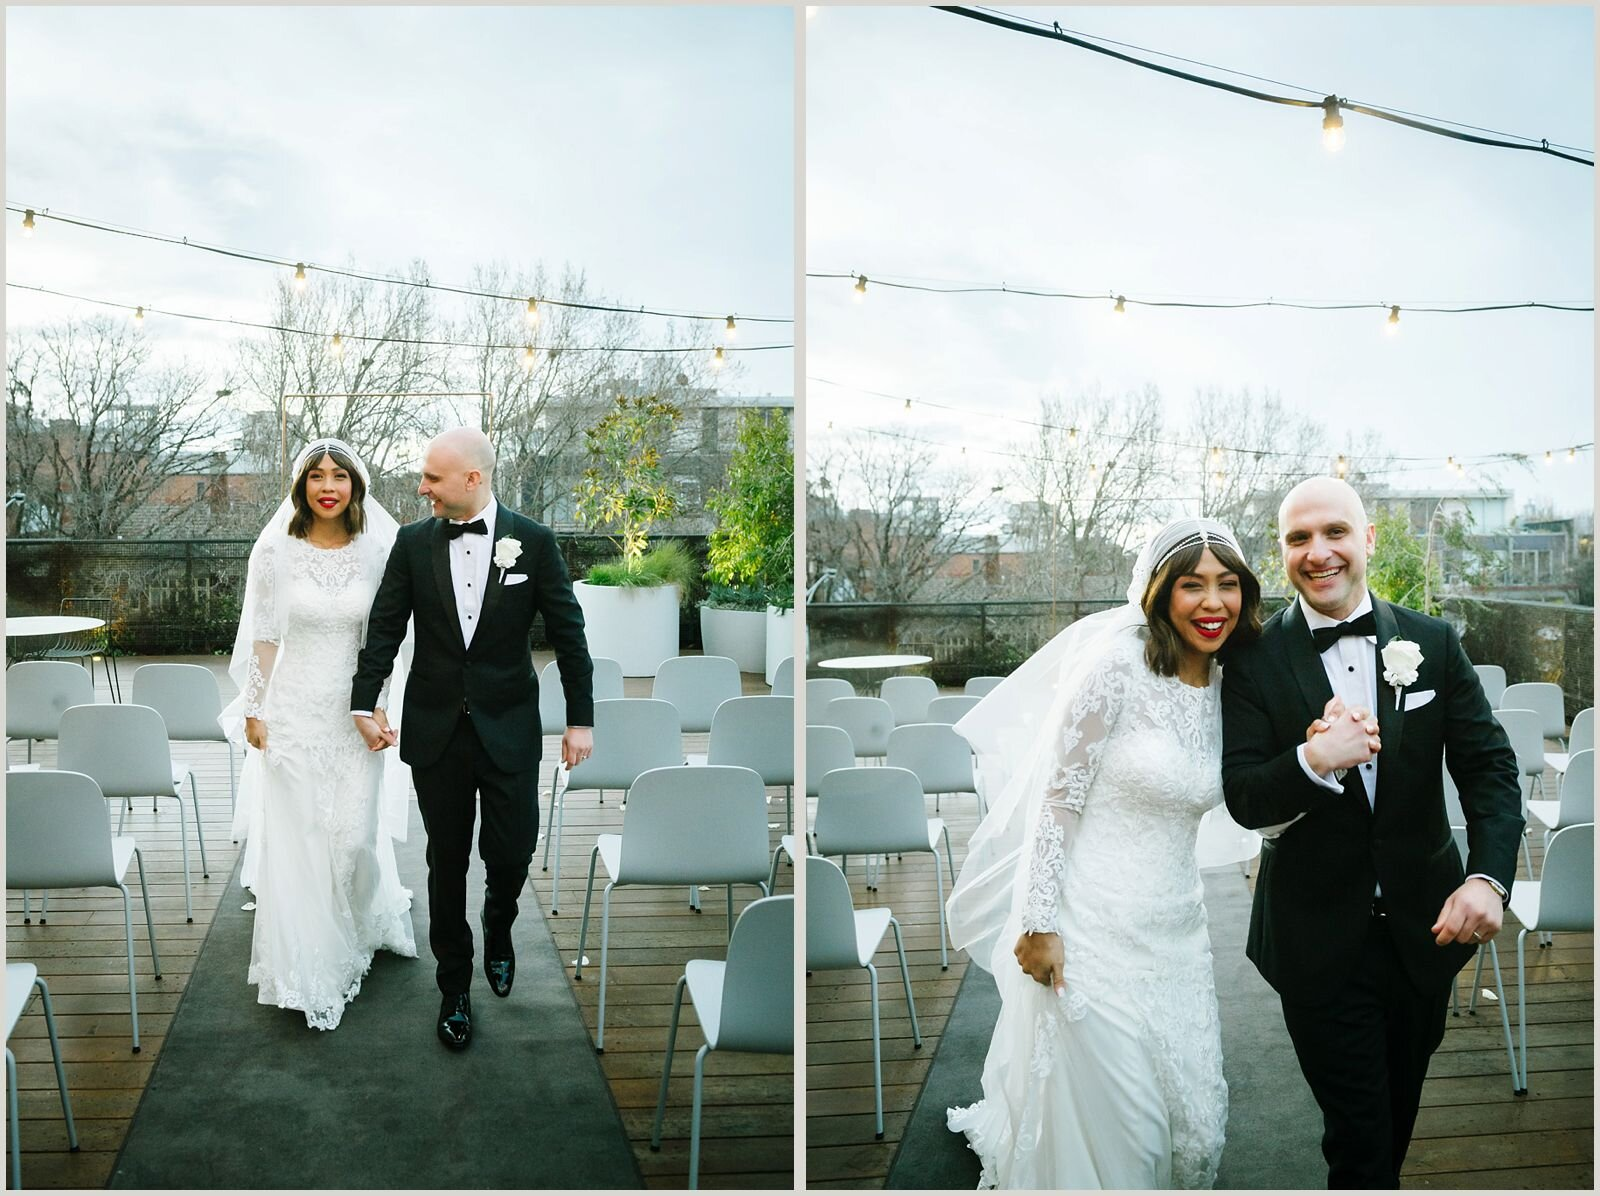 joseph_koprek_wedding_melbourne_the_prince_deck_0066.jpg